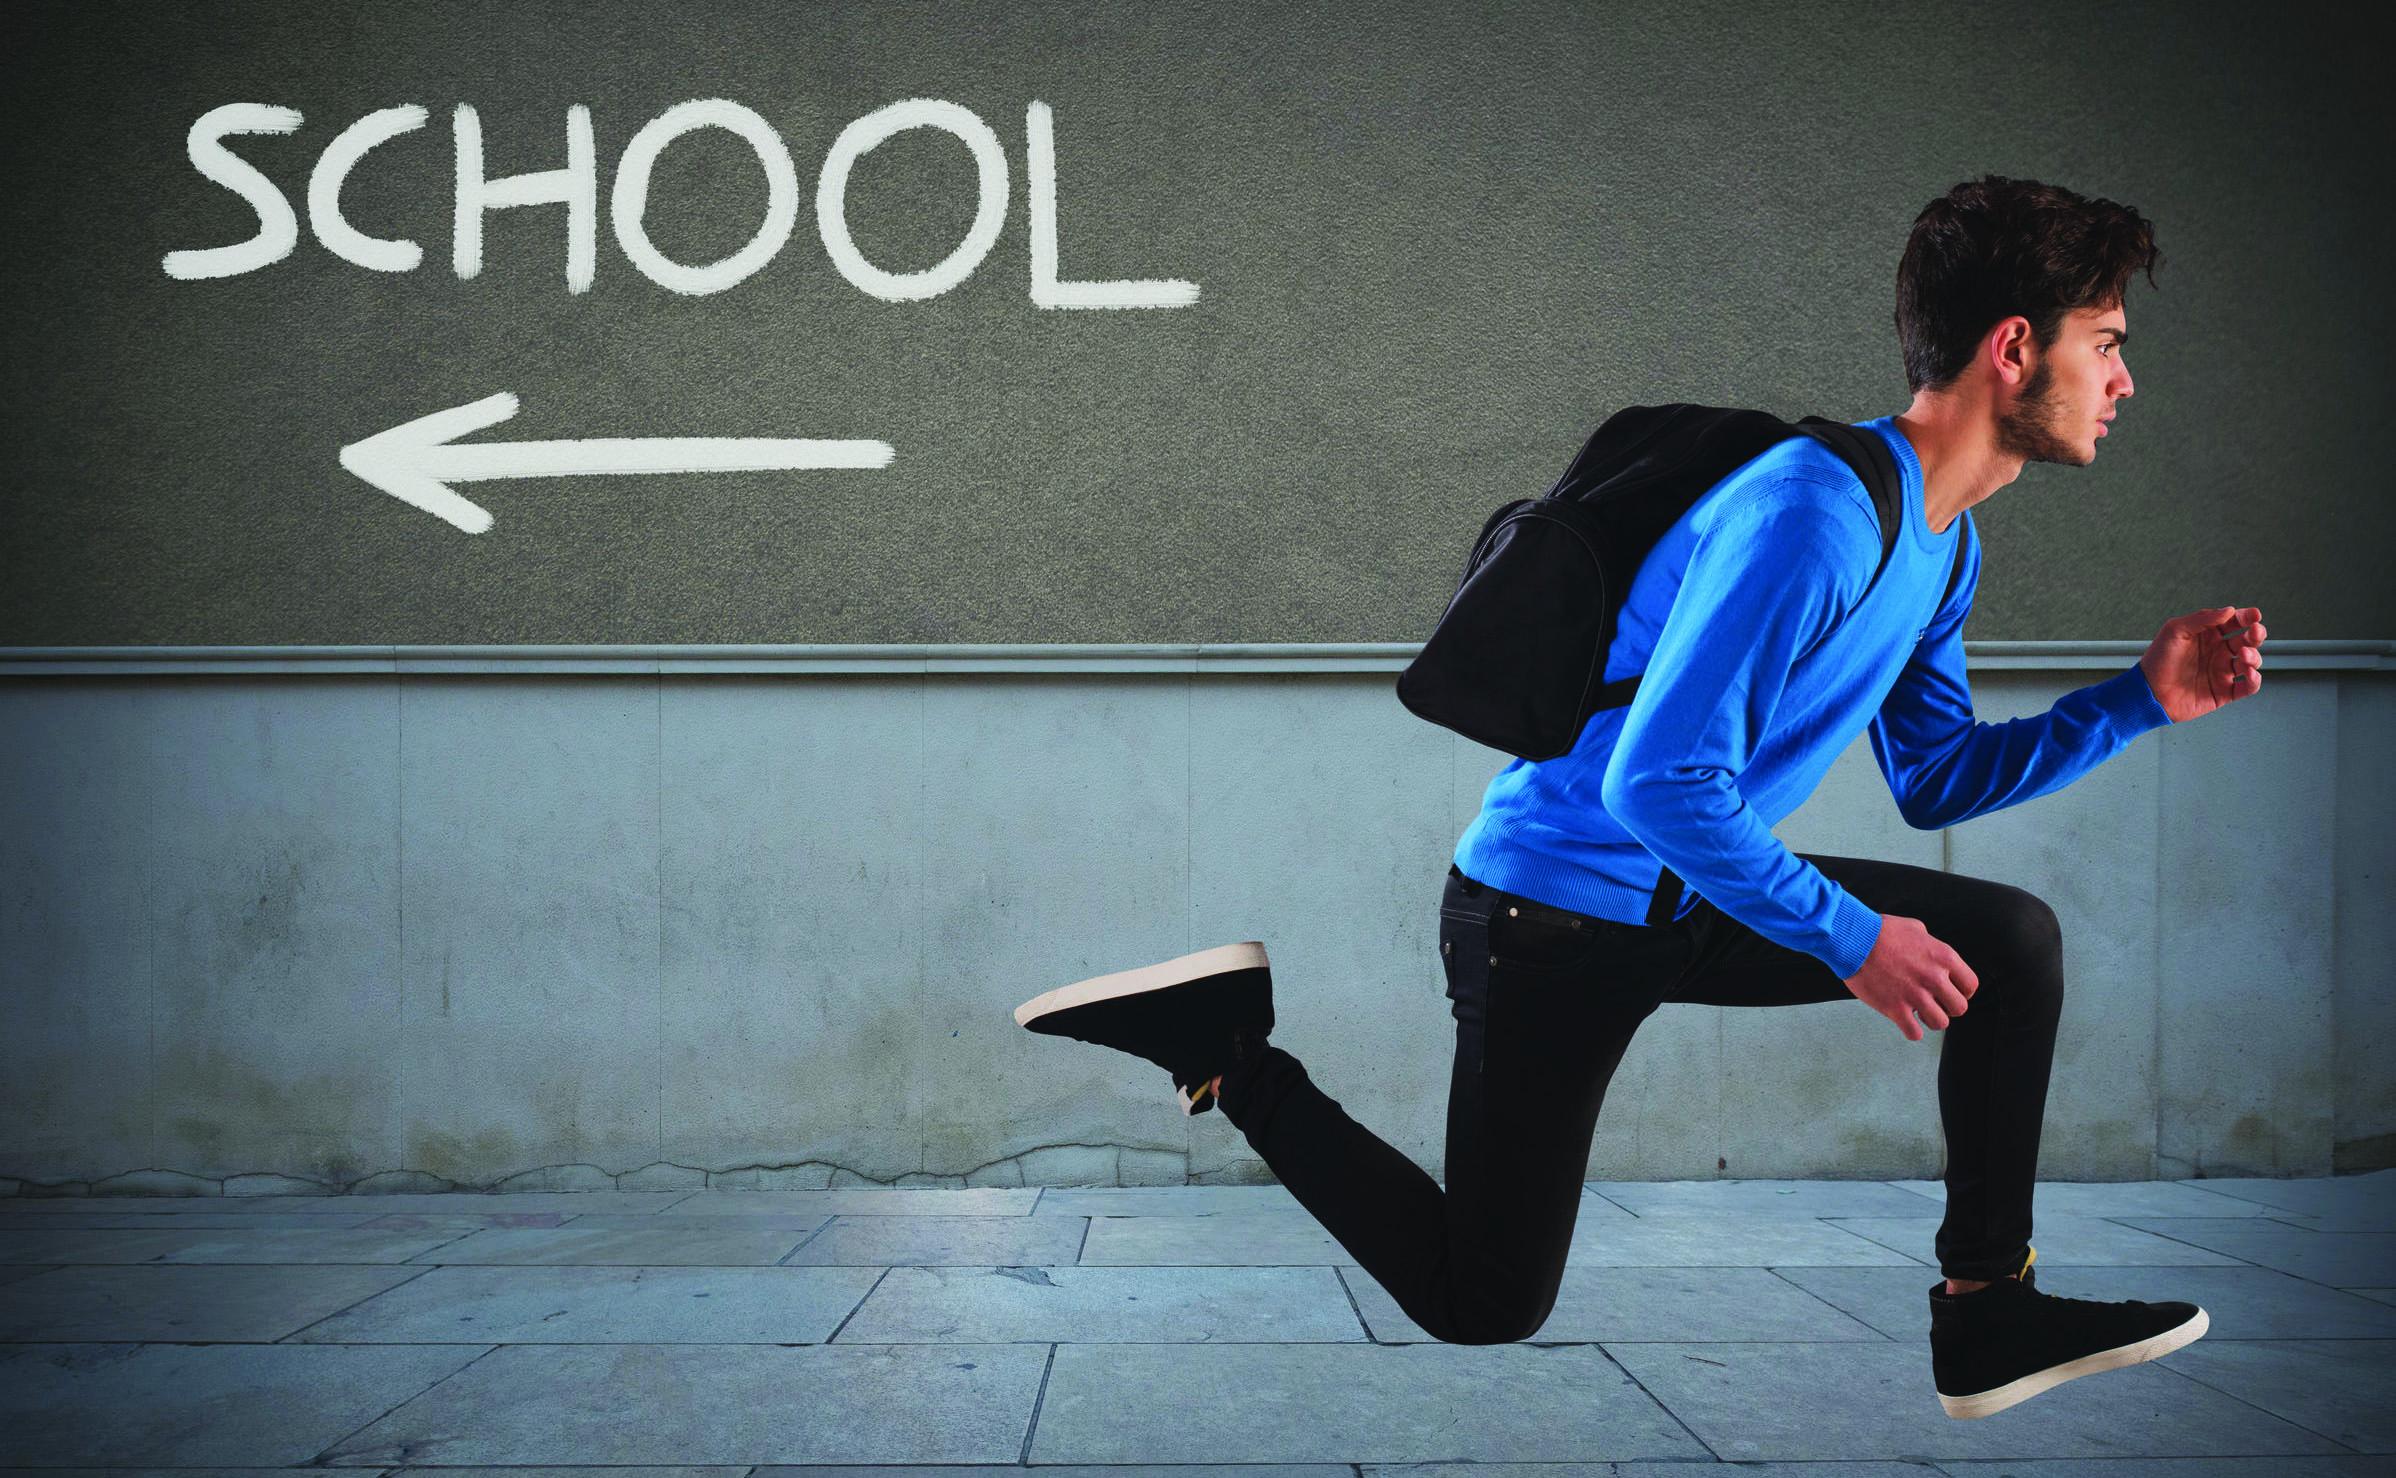 Boy runnning from school.jpg